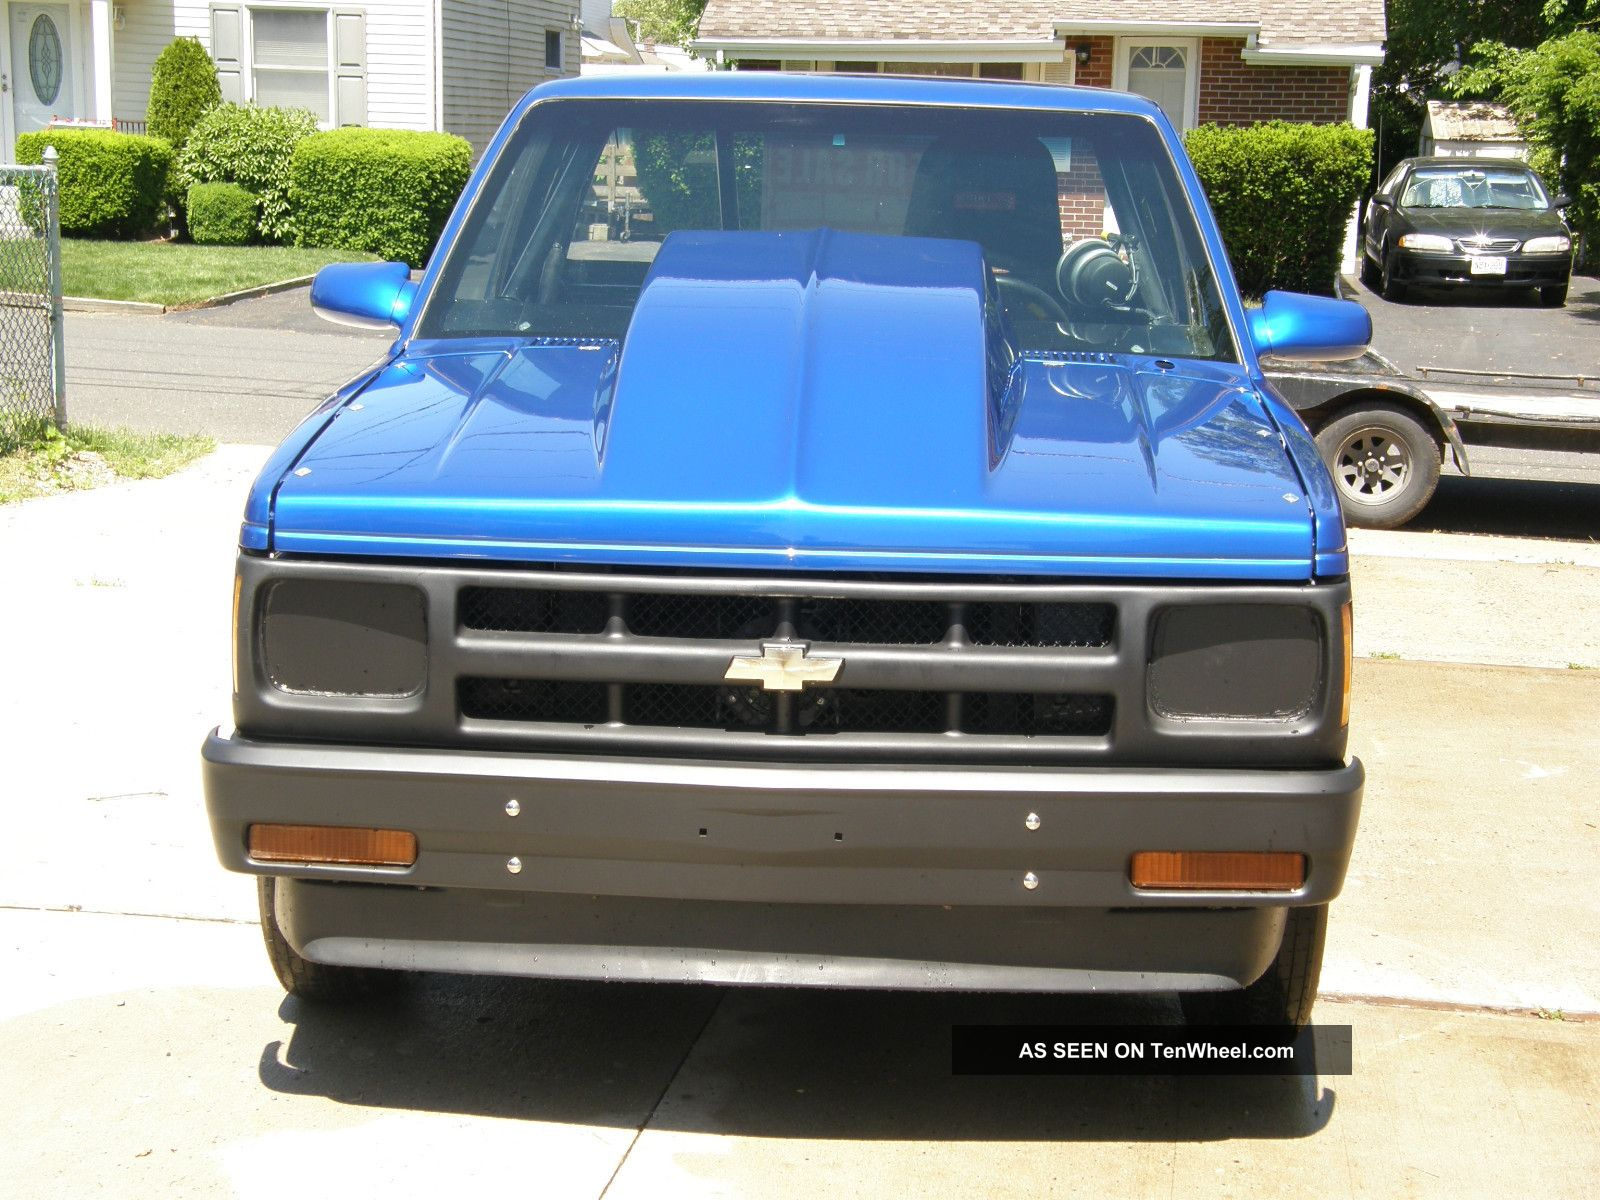 [CSDW_4250]   C29E 1983s 10 Truck Wiring Diagram | Wiring Library | Chevrolet Malibu 2009 2012 20965912 Headlight Wiring Harness |  | Wiring Library